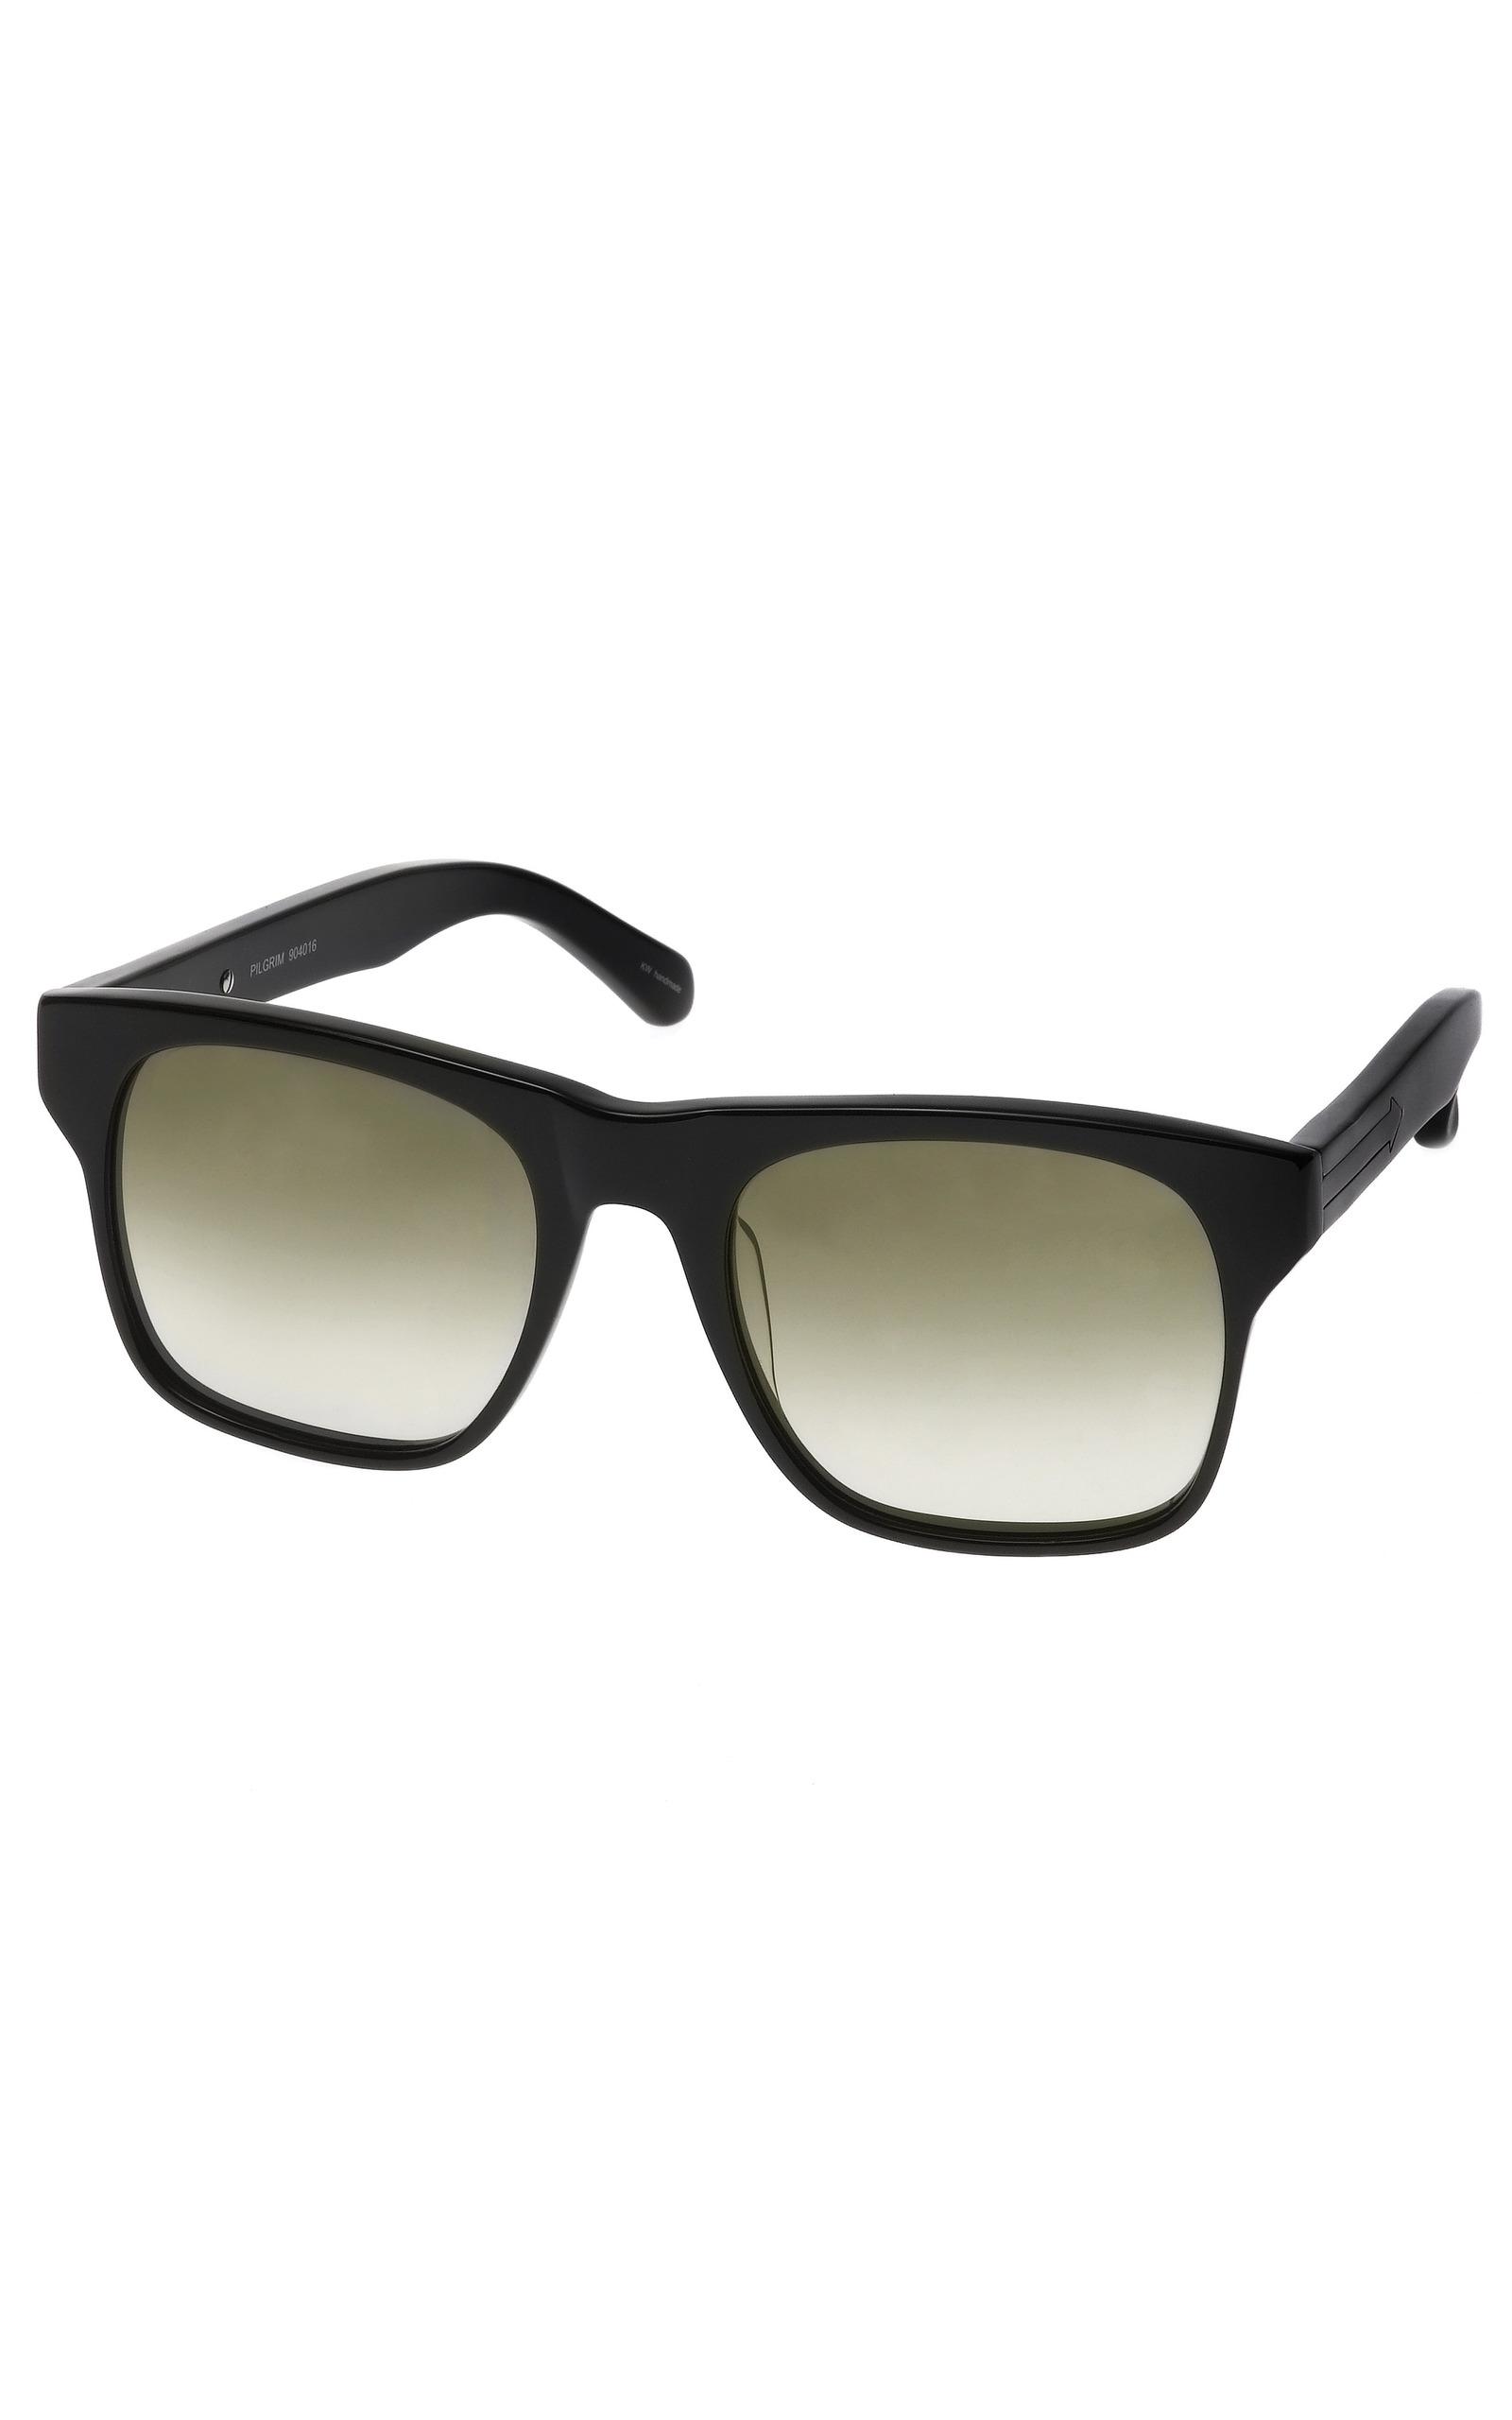 450944f3f690 Pilgrim Black Sunglasses by Karen Walker | Moda Operandi